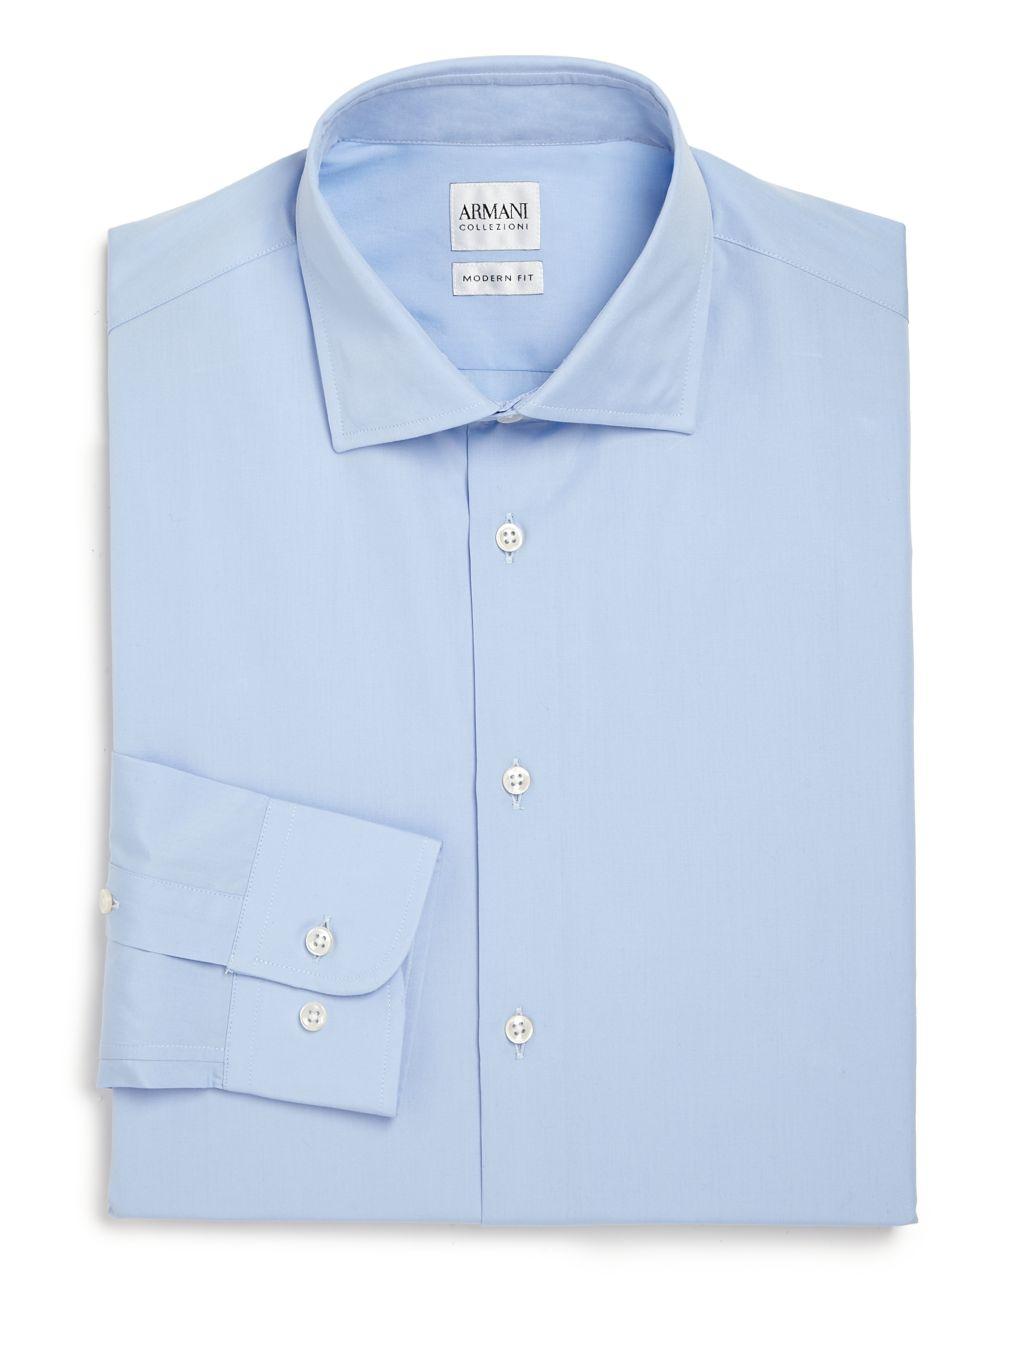 Armani Collezioni Modern-Fit Cotton Dress Shirt